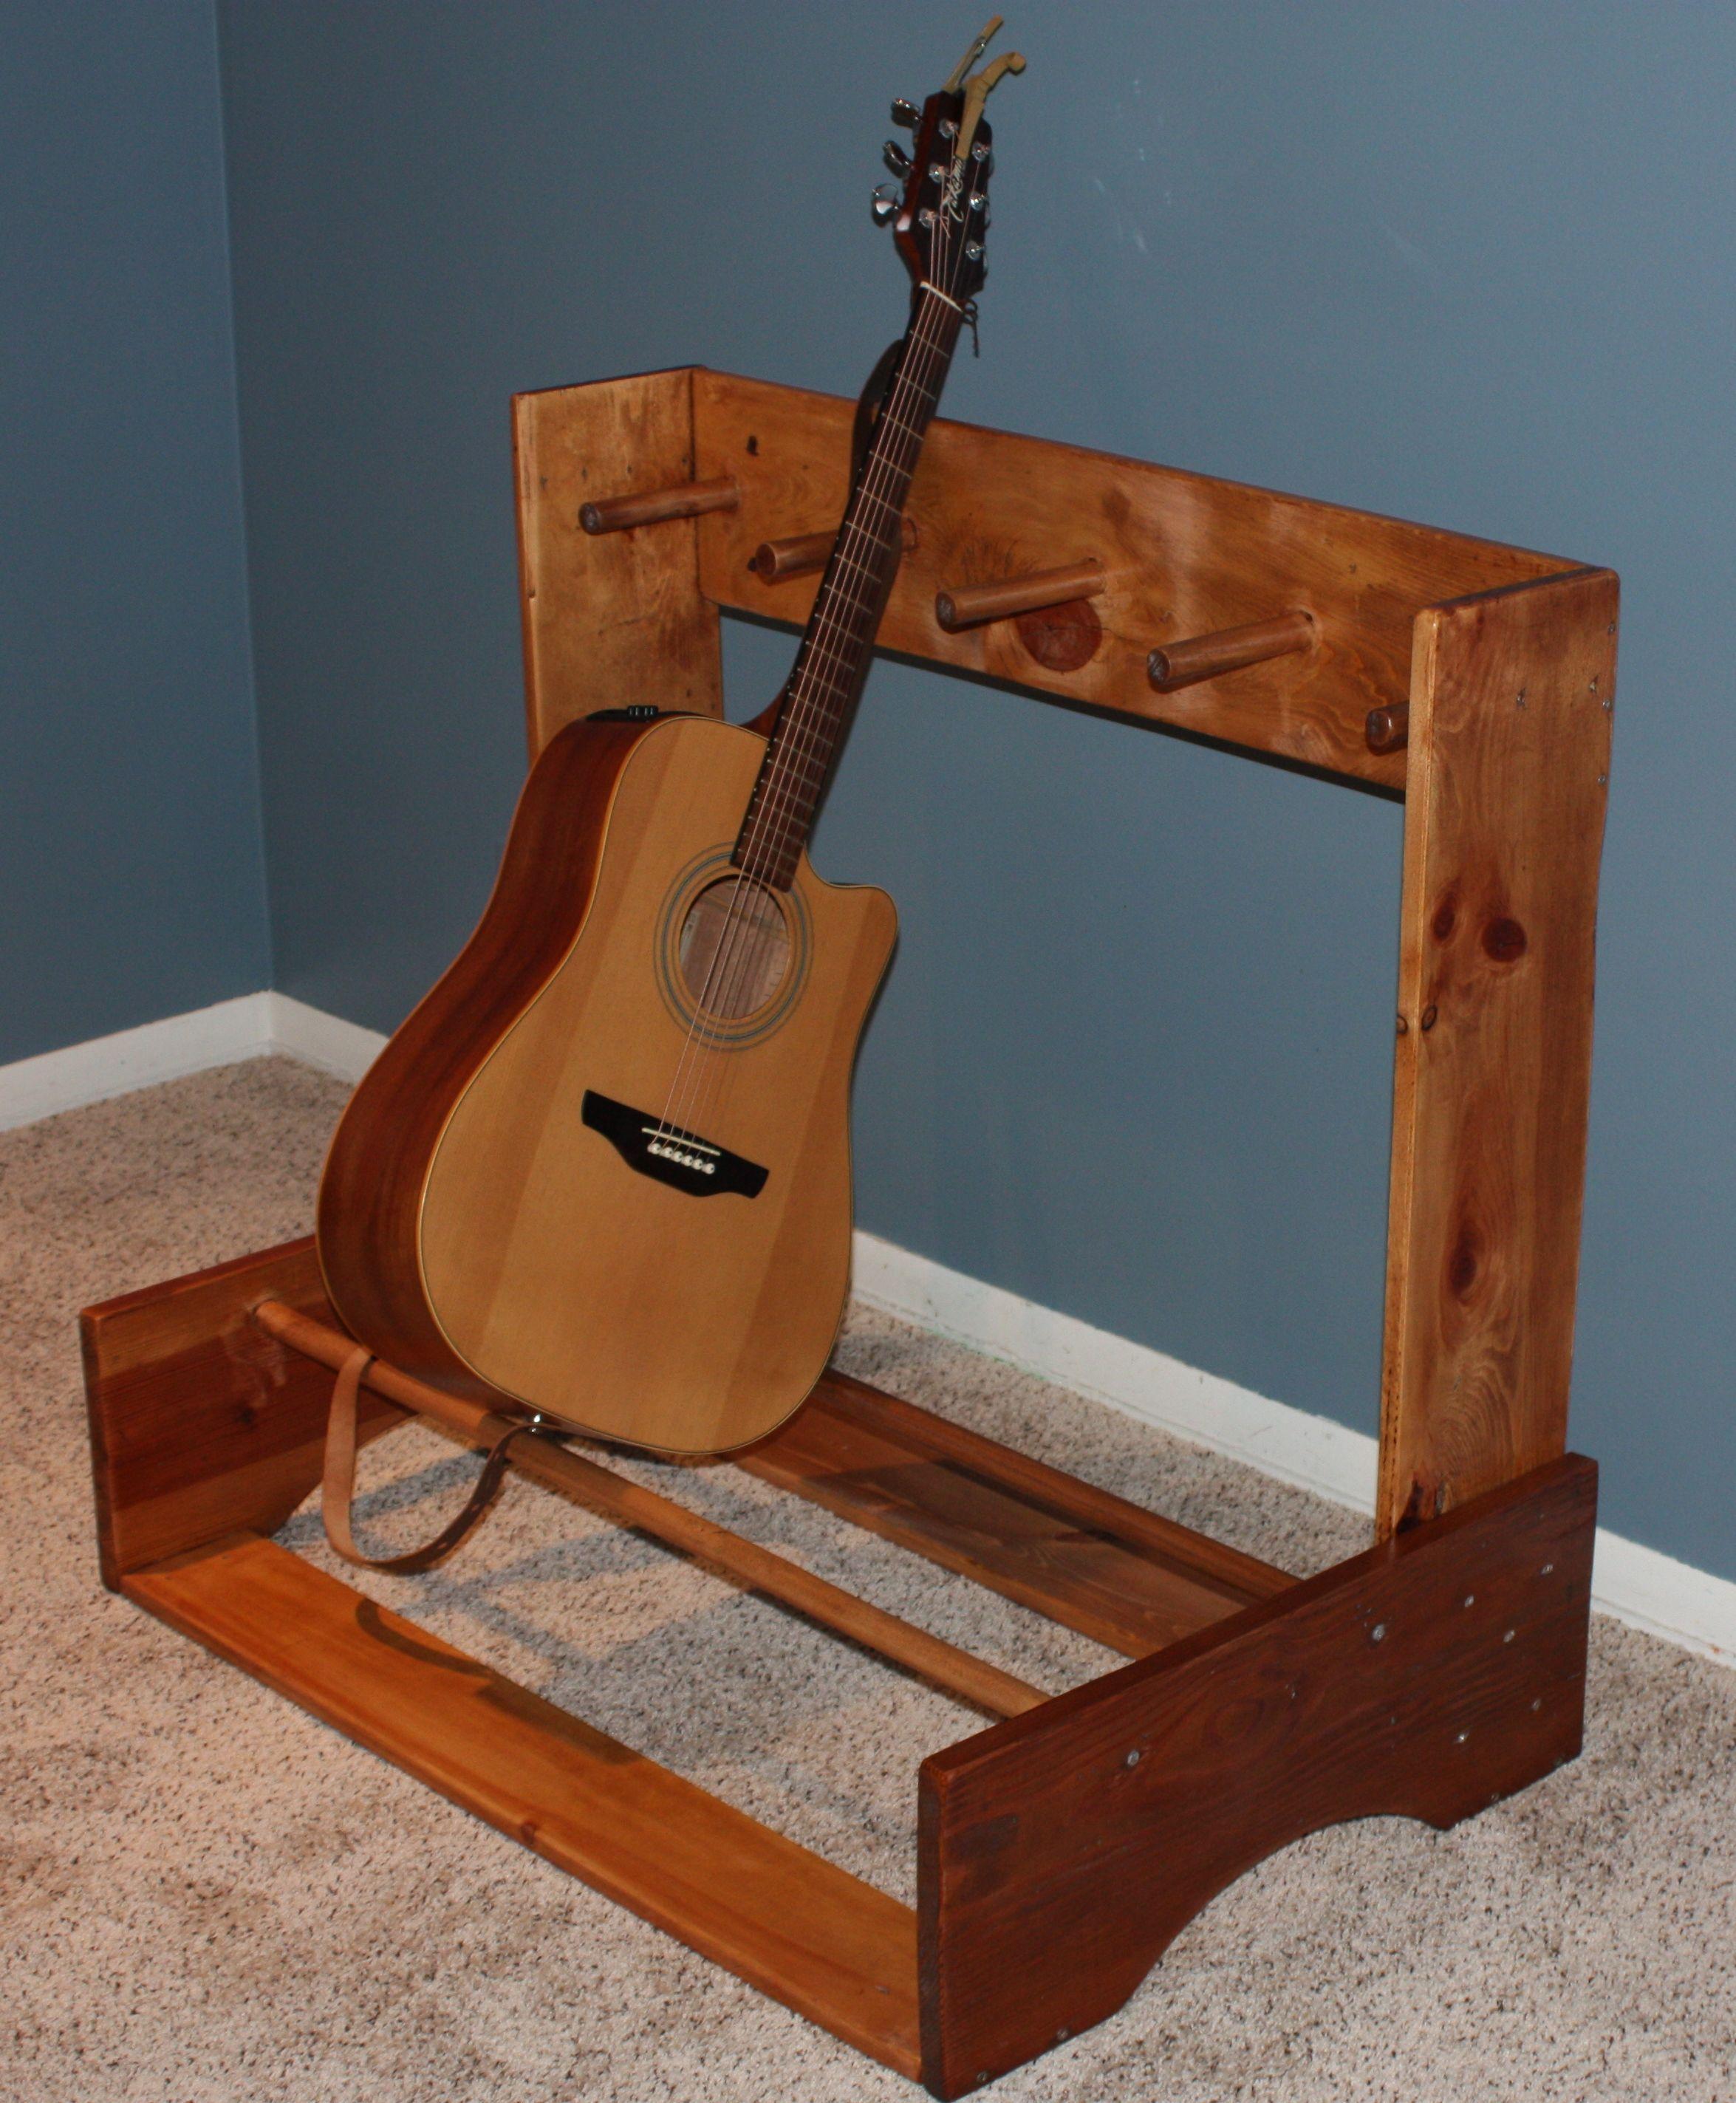 Diy Guitar Humidifier Cabinet 2020 Diy Guitar Stand Guitar Stand Wooden Guitar Stand